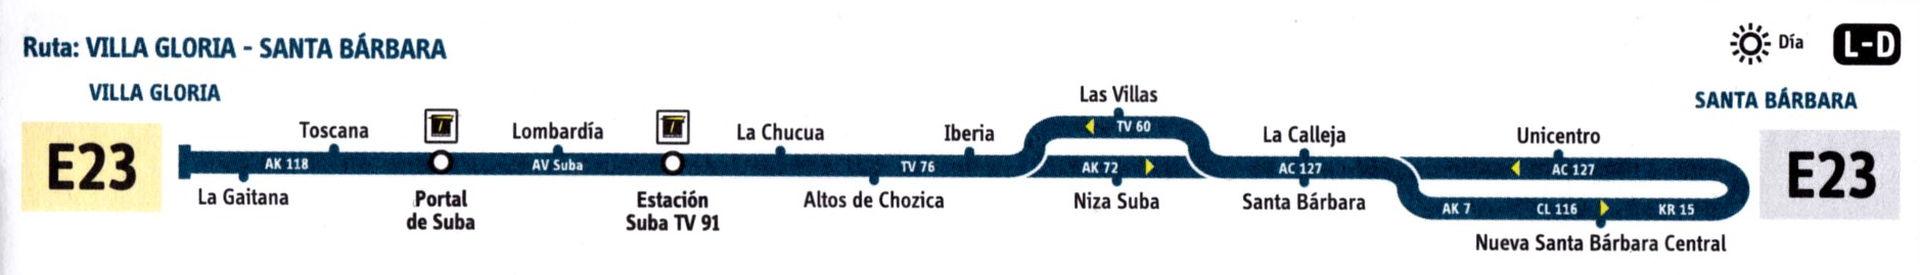 Ruta SITP: E23 Villa Gloria ↔ Santa Bárbara [Urbana] 1